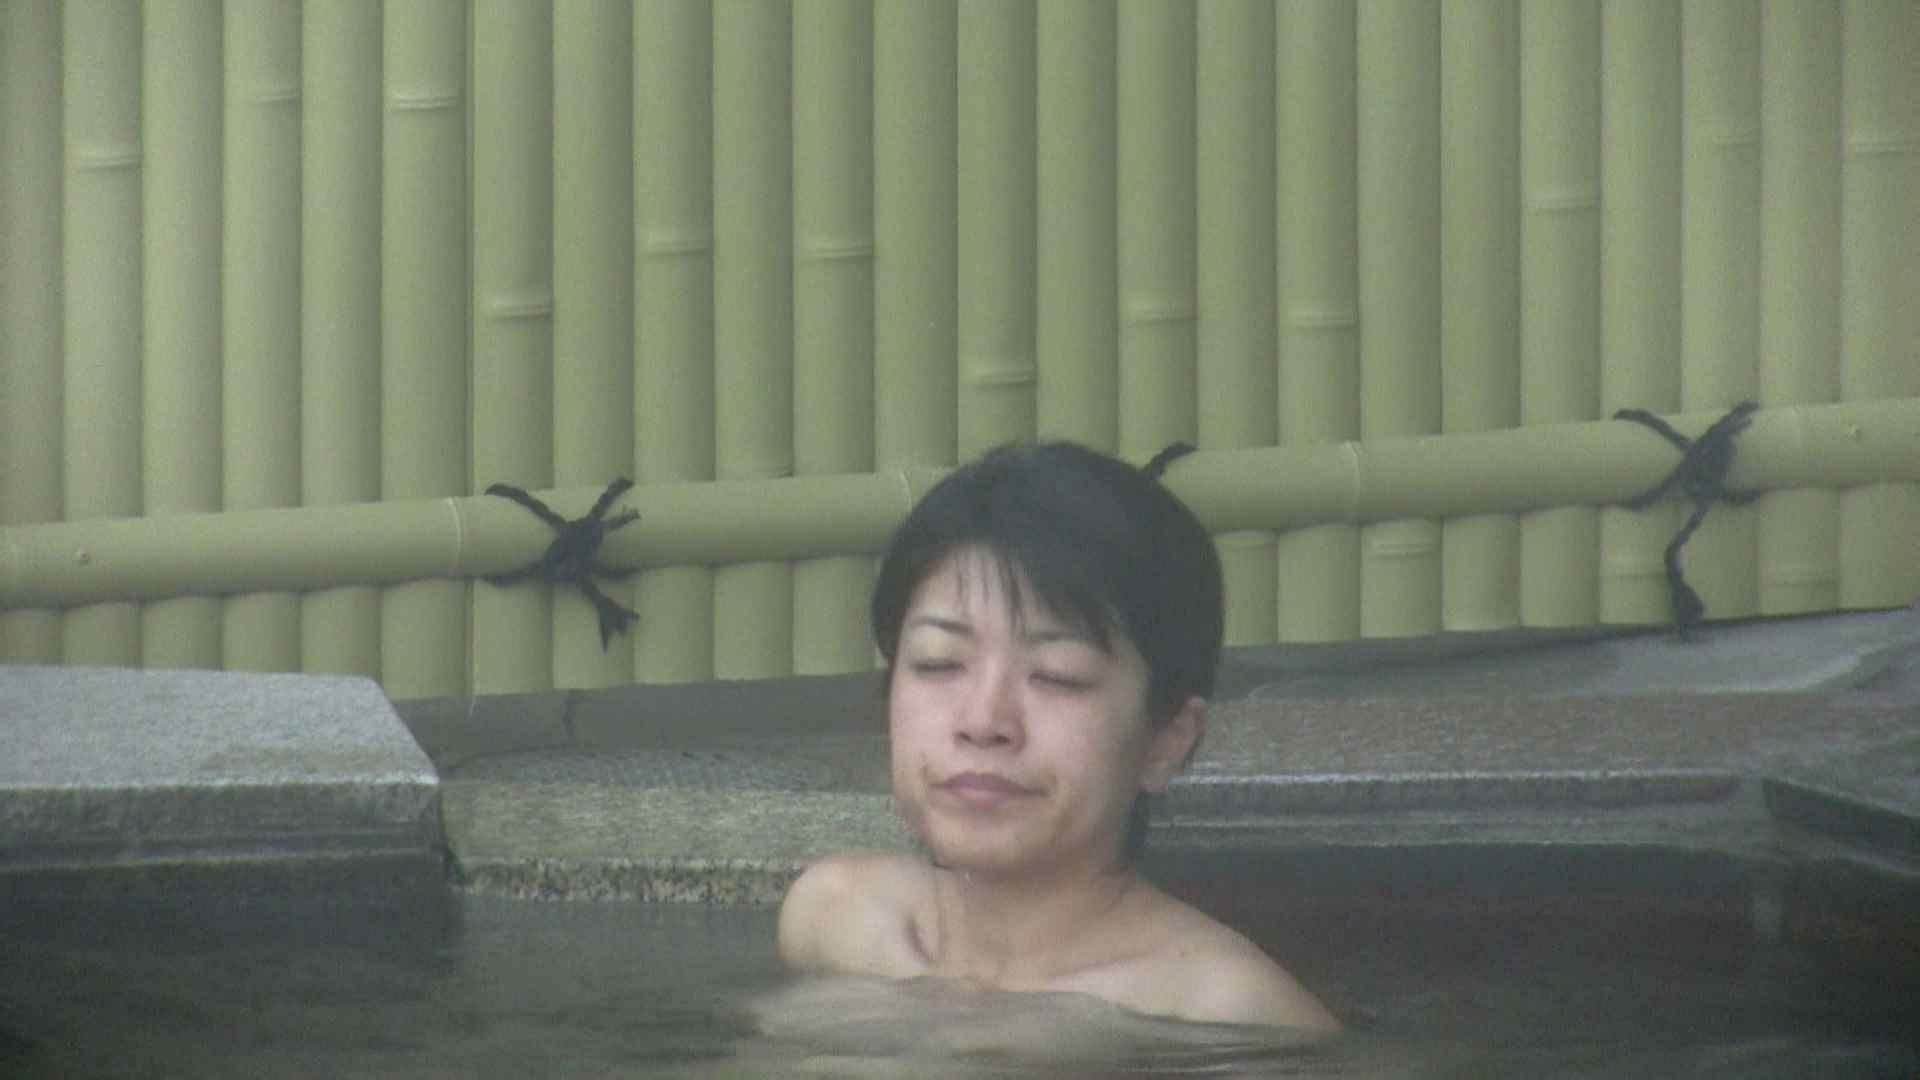 Aquaな露天風呂Vol.585 HなOL | 盗撮  93pic 72